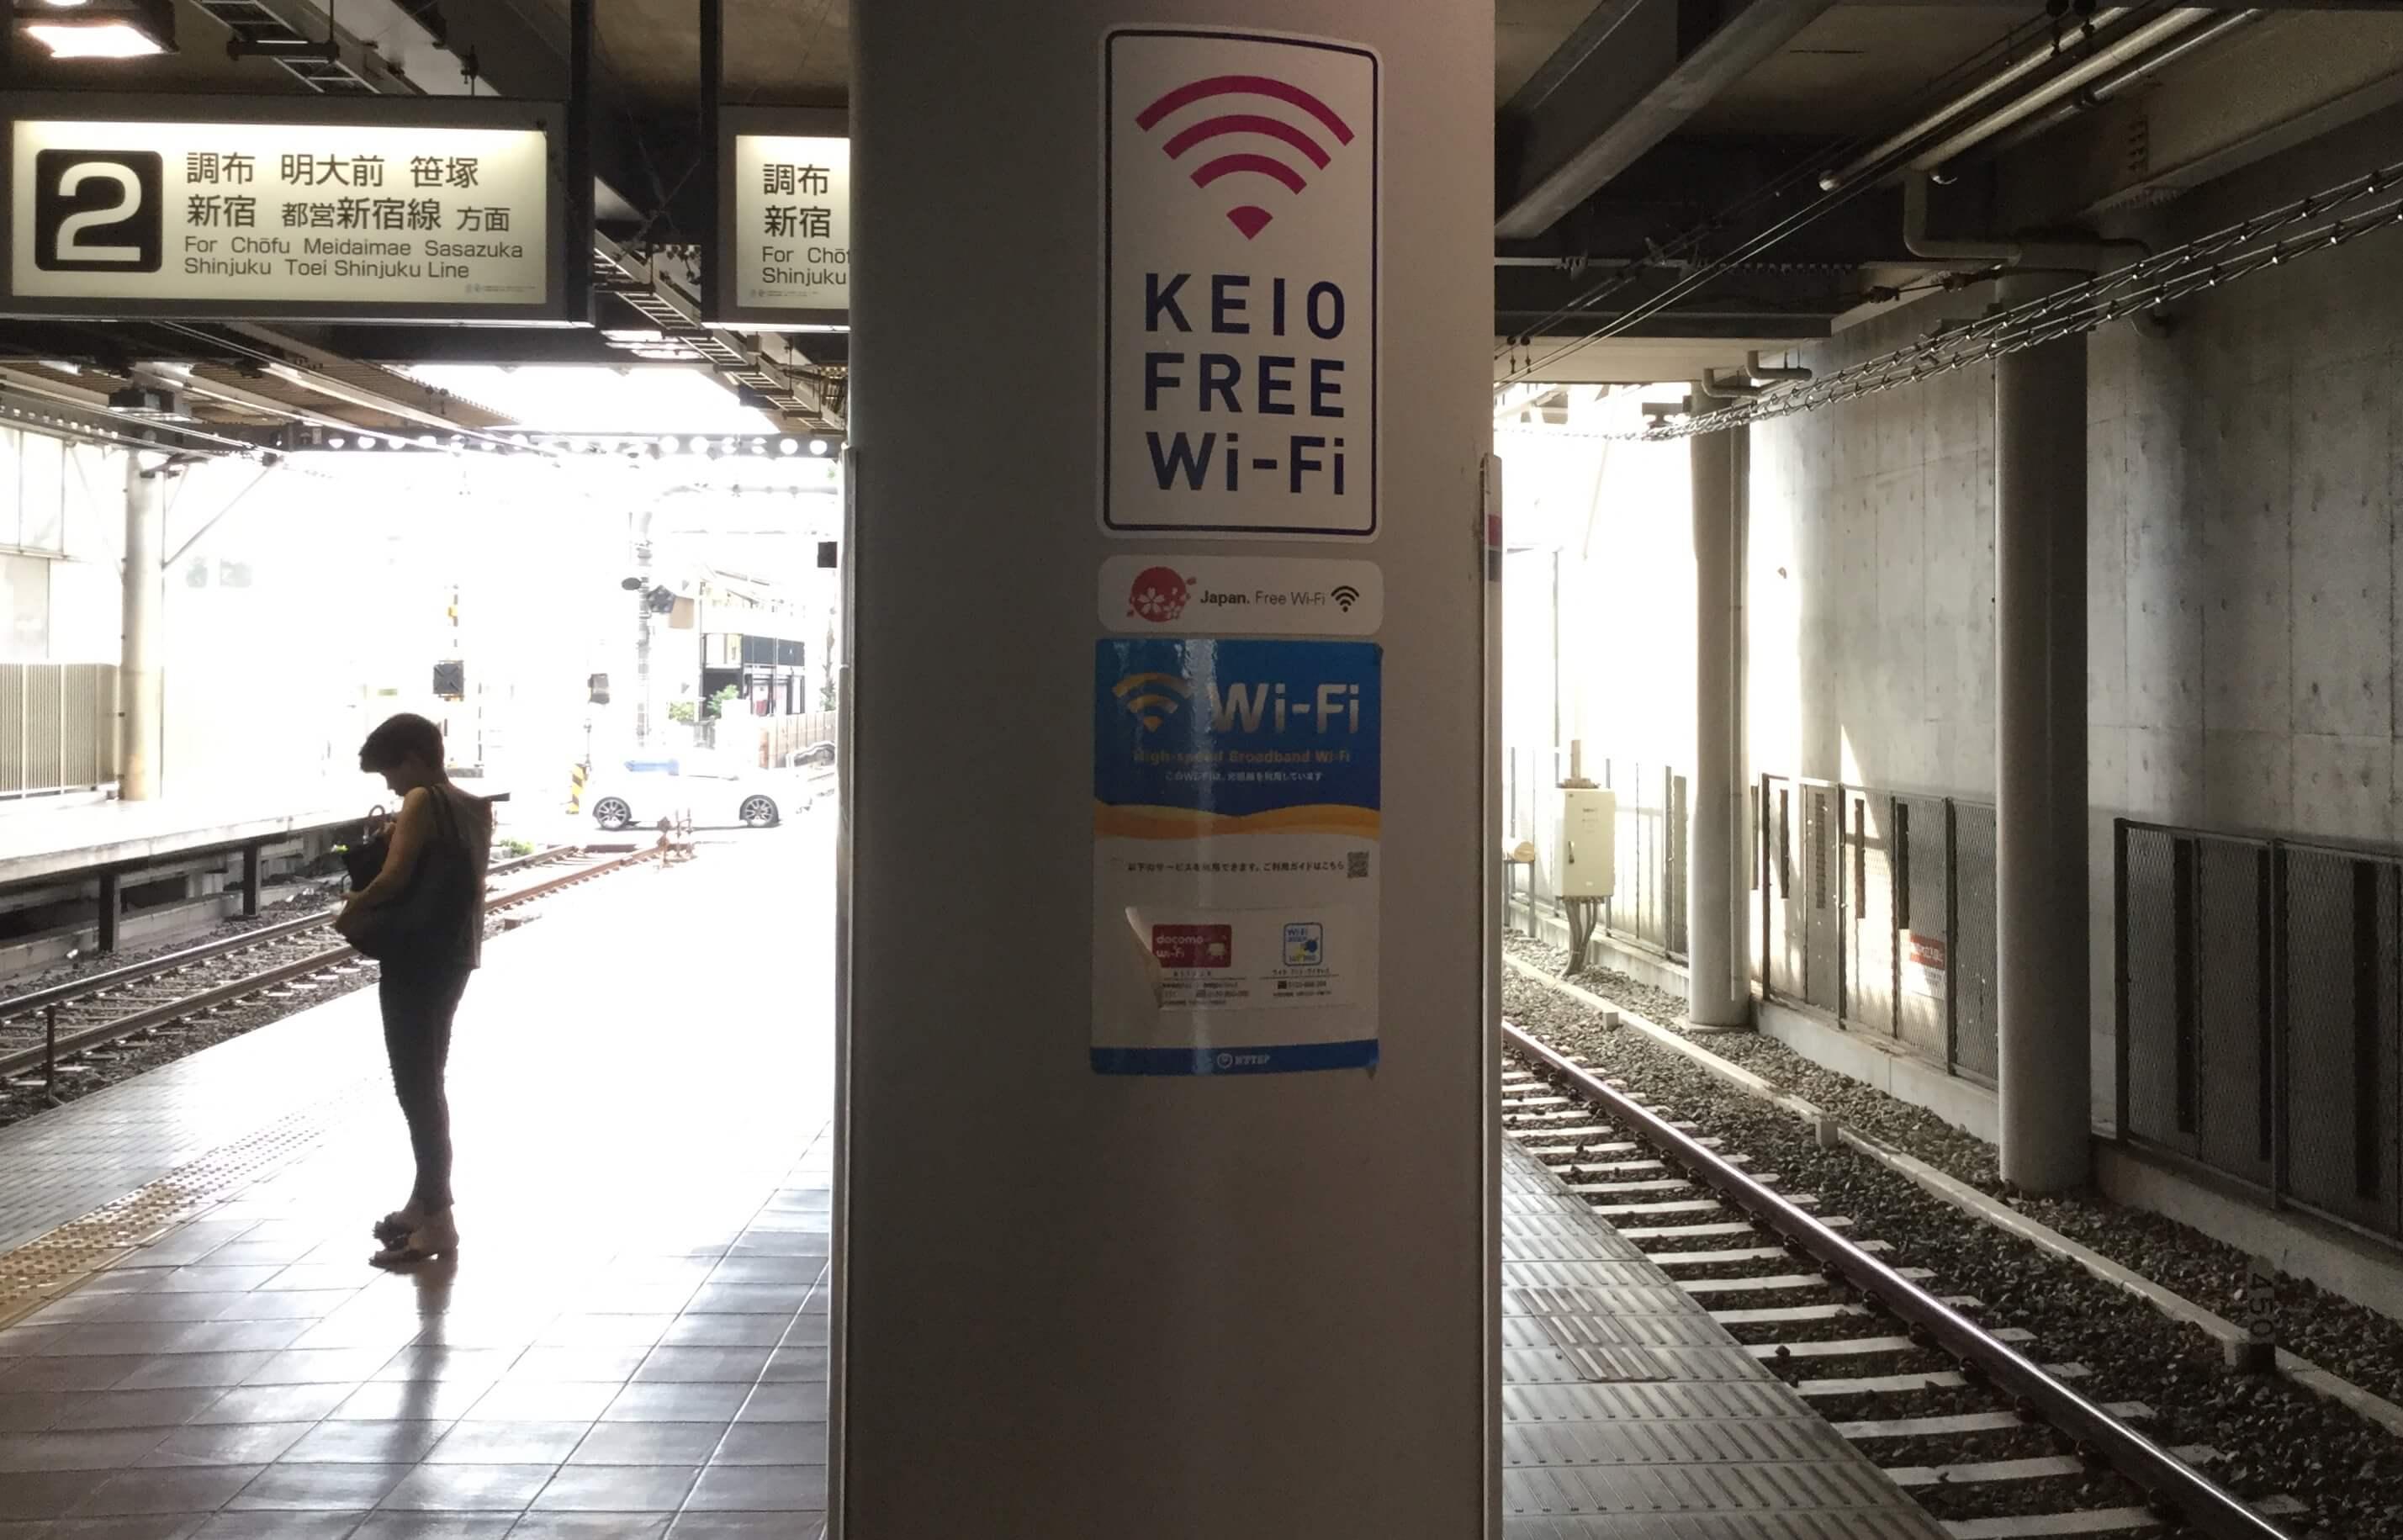 Free wifi in Tokyo sign, Keio Line platform